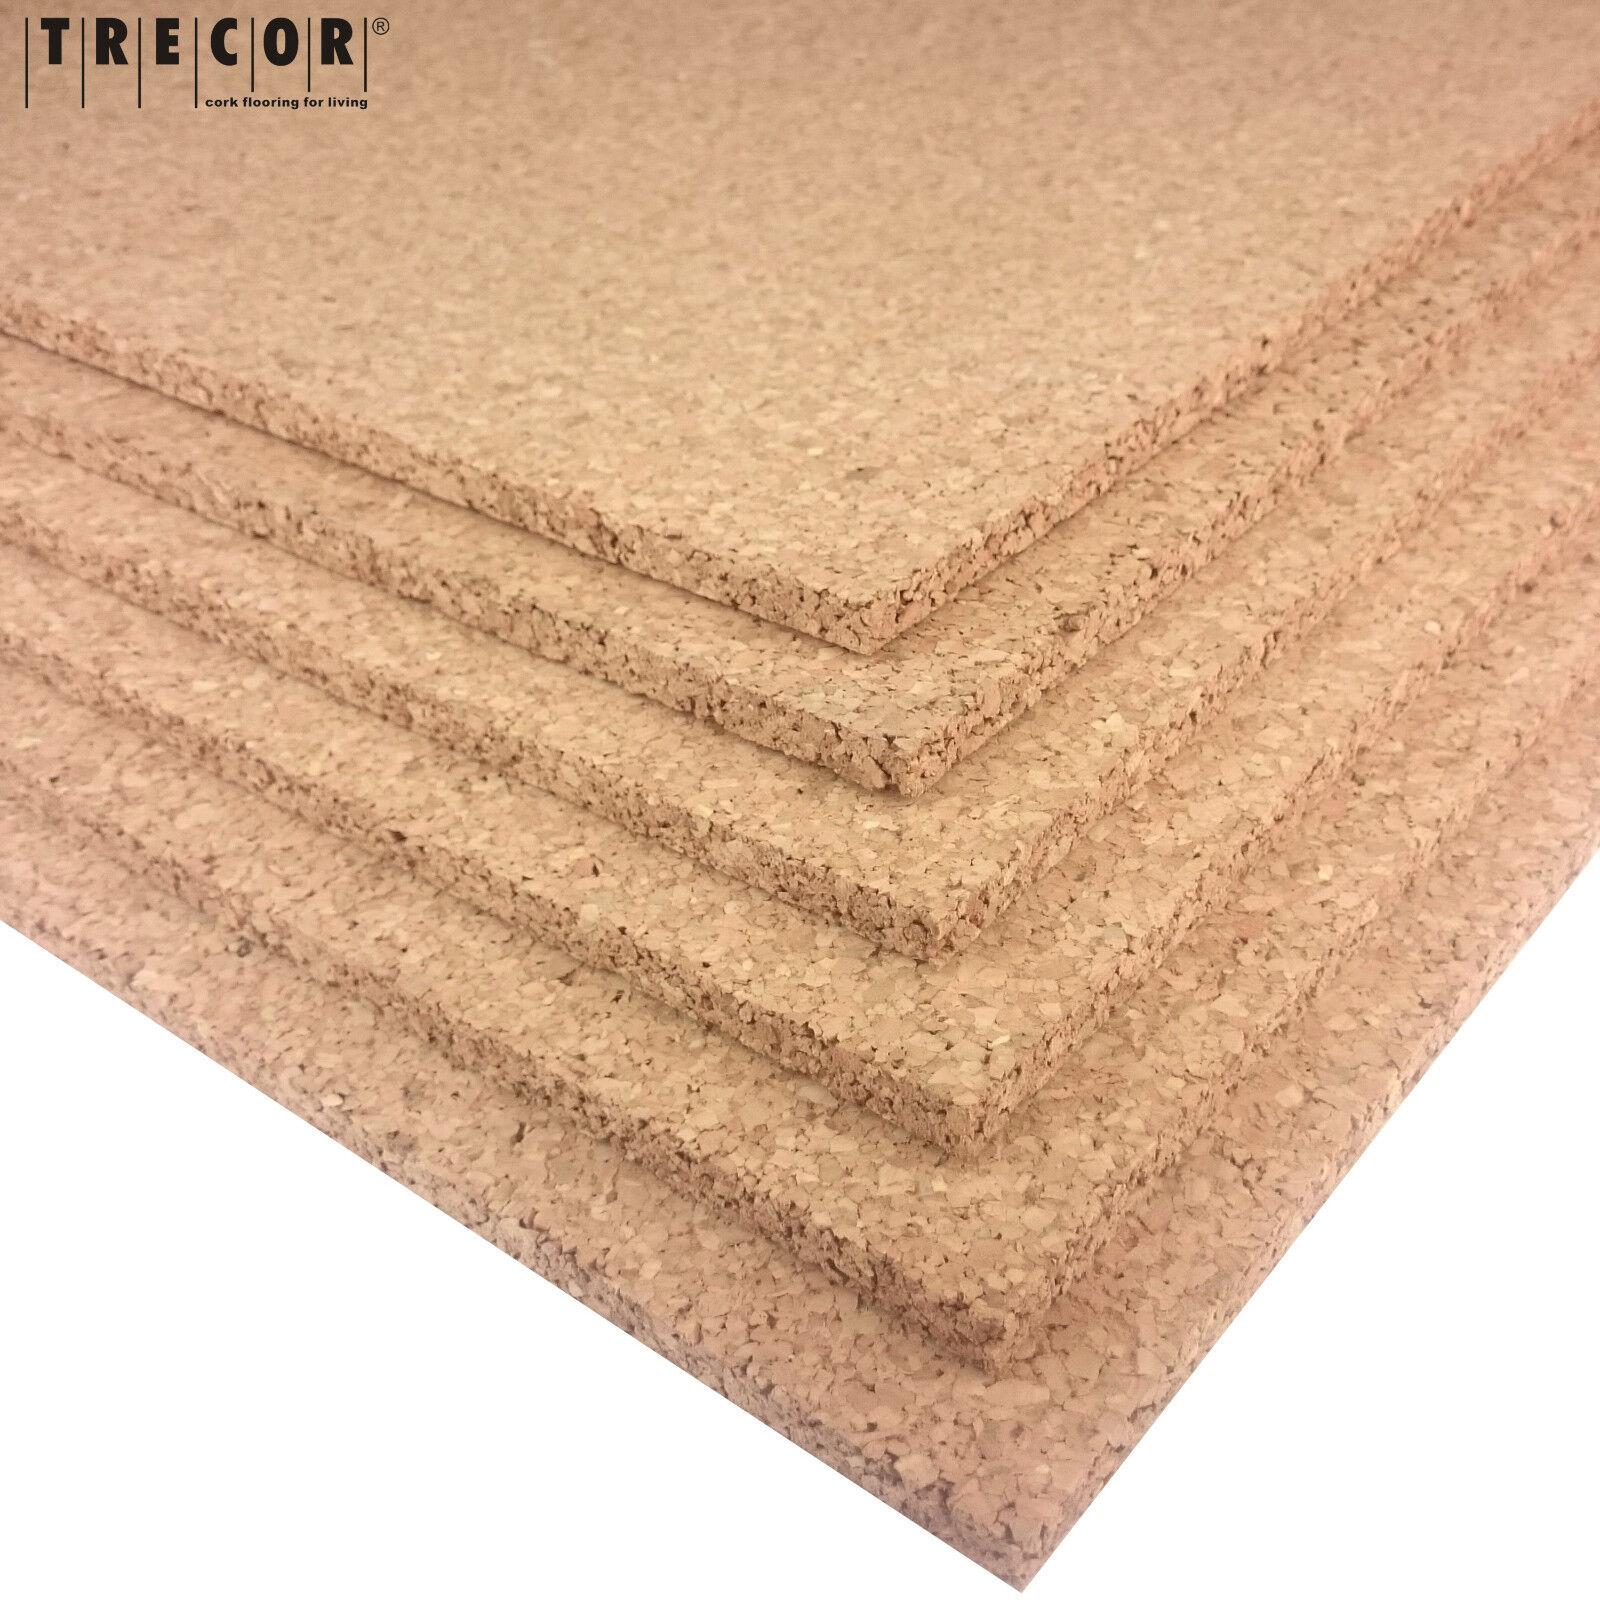 trecor Pinnwand Korkplatten 2 - 20 mm Stark -XXL-Format: 100 x 50 cm - TOPSELLER